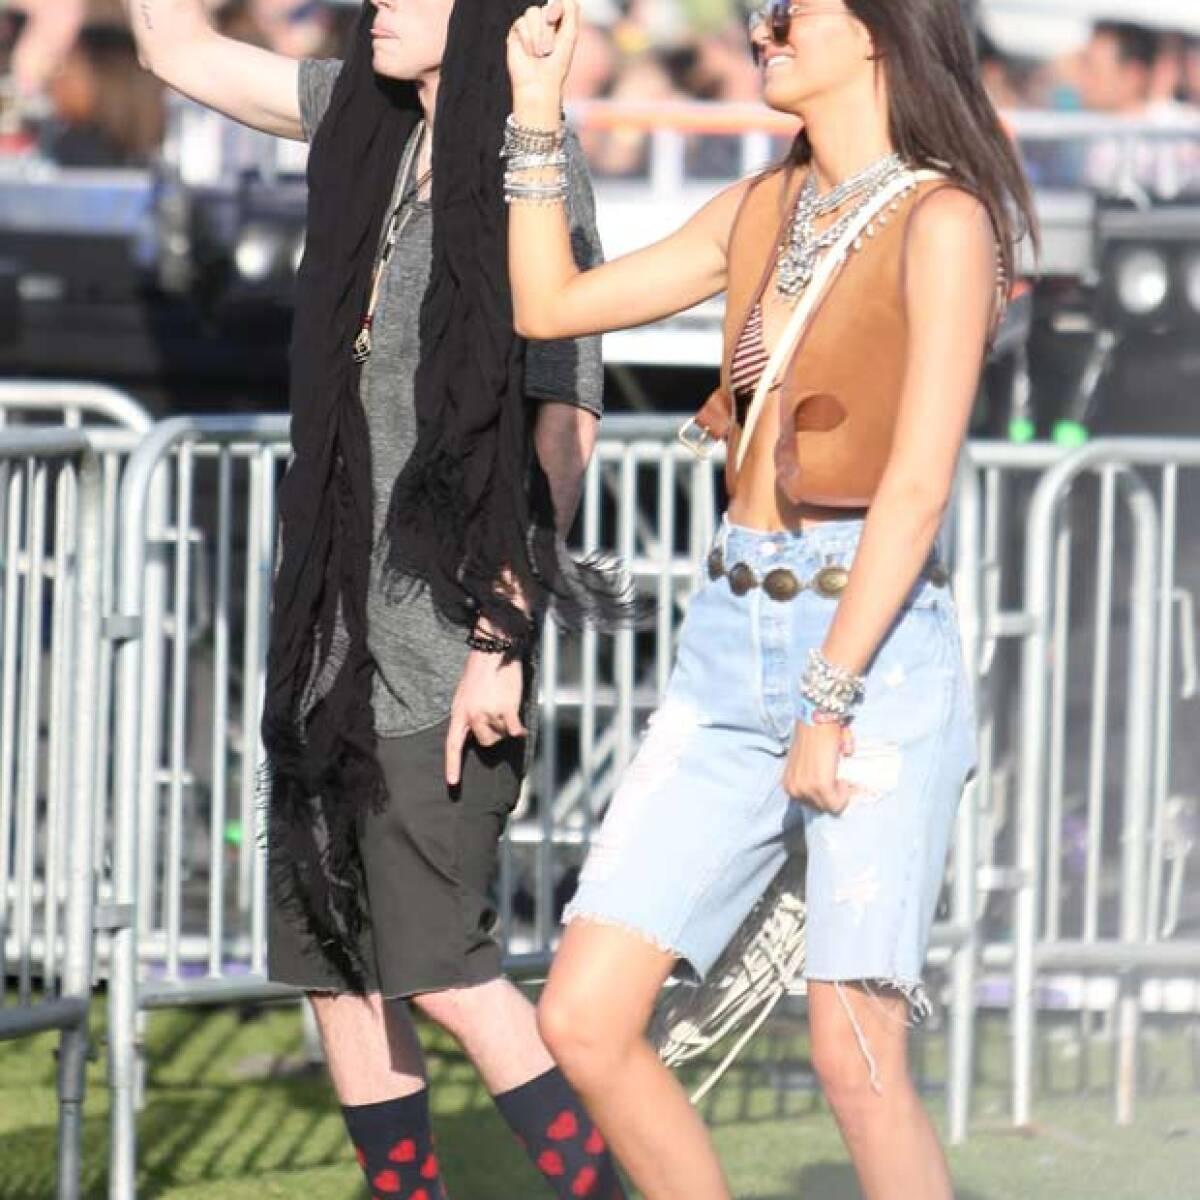 Kendall y Kylie Jenner derrochan sexytud en Coachella